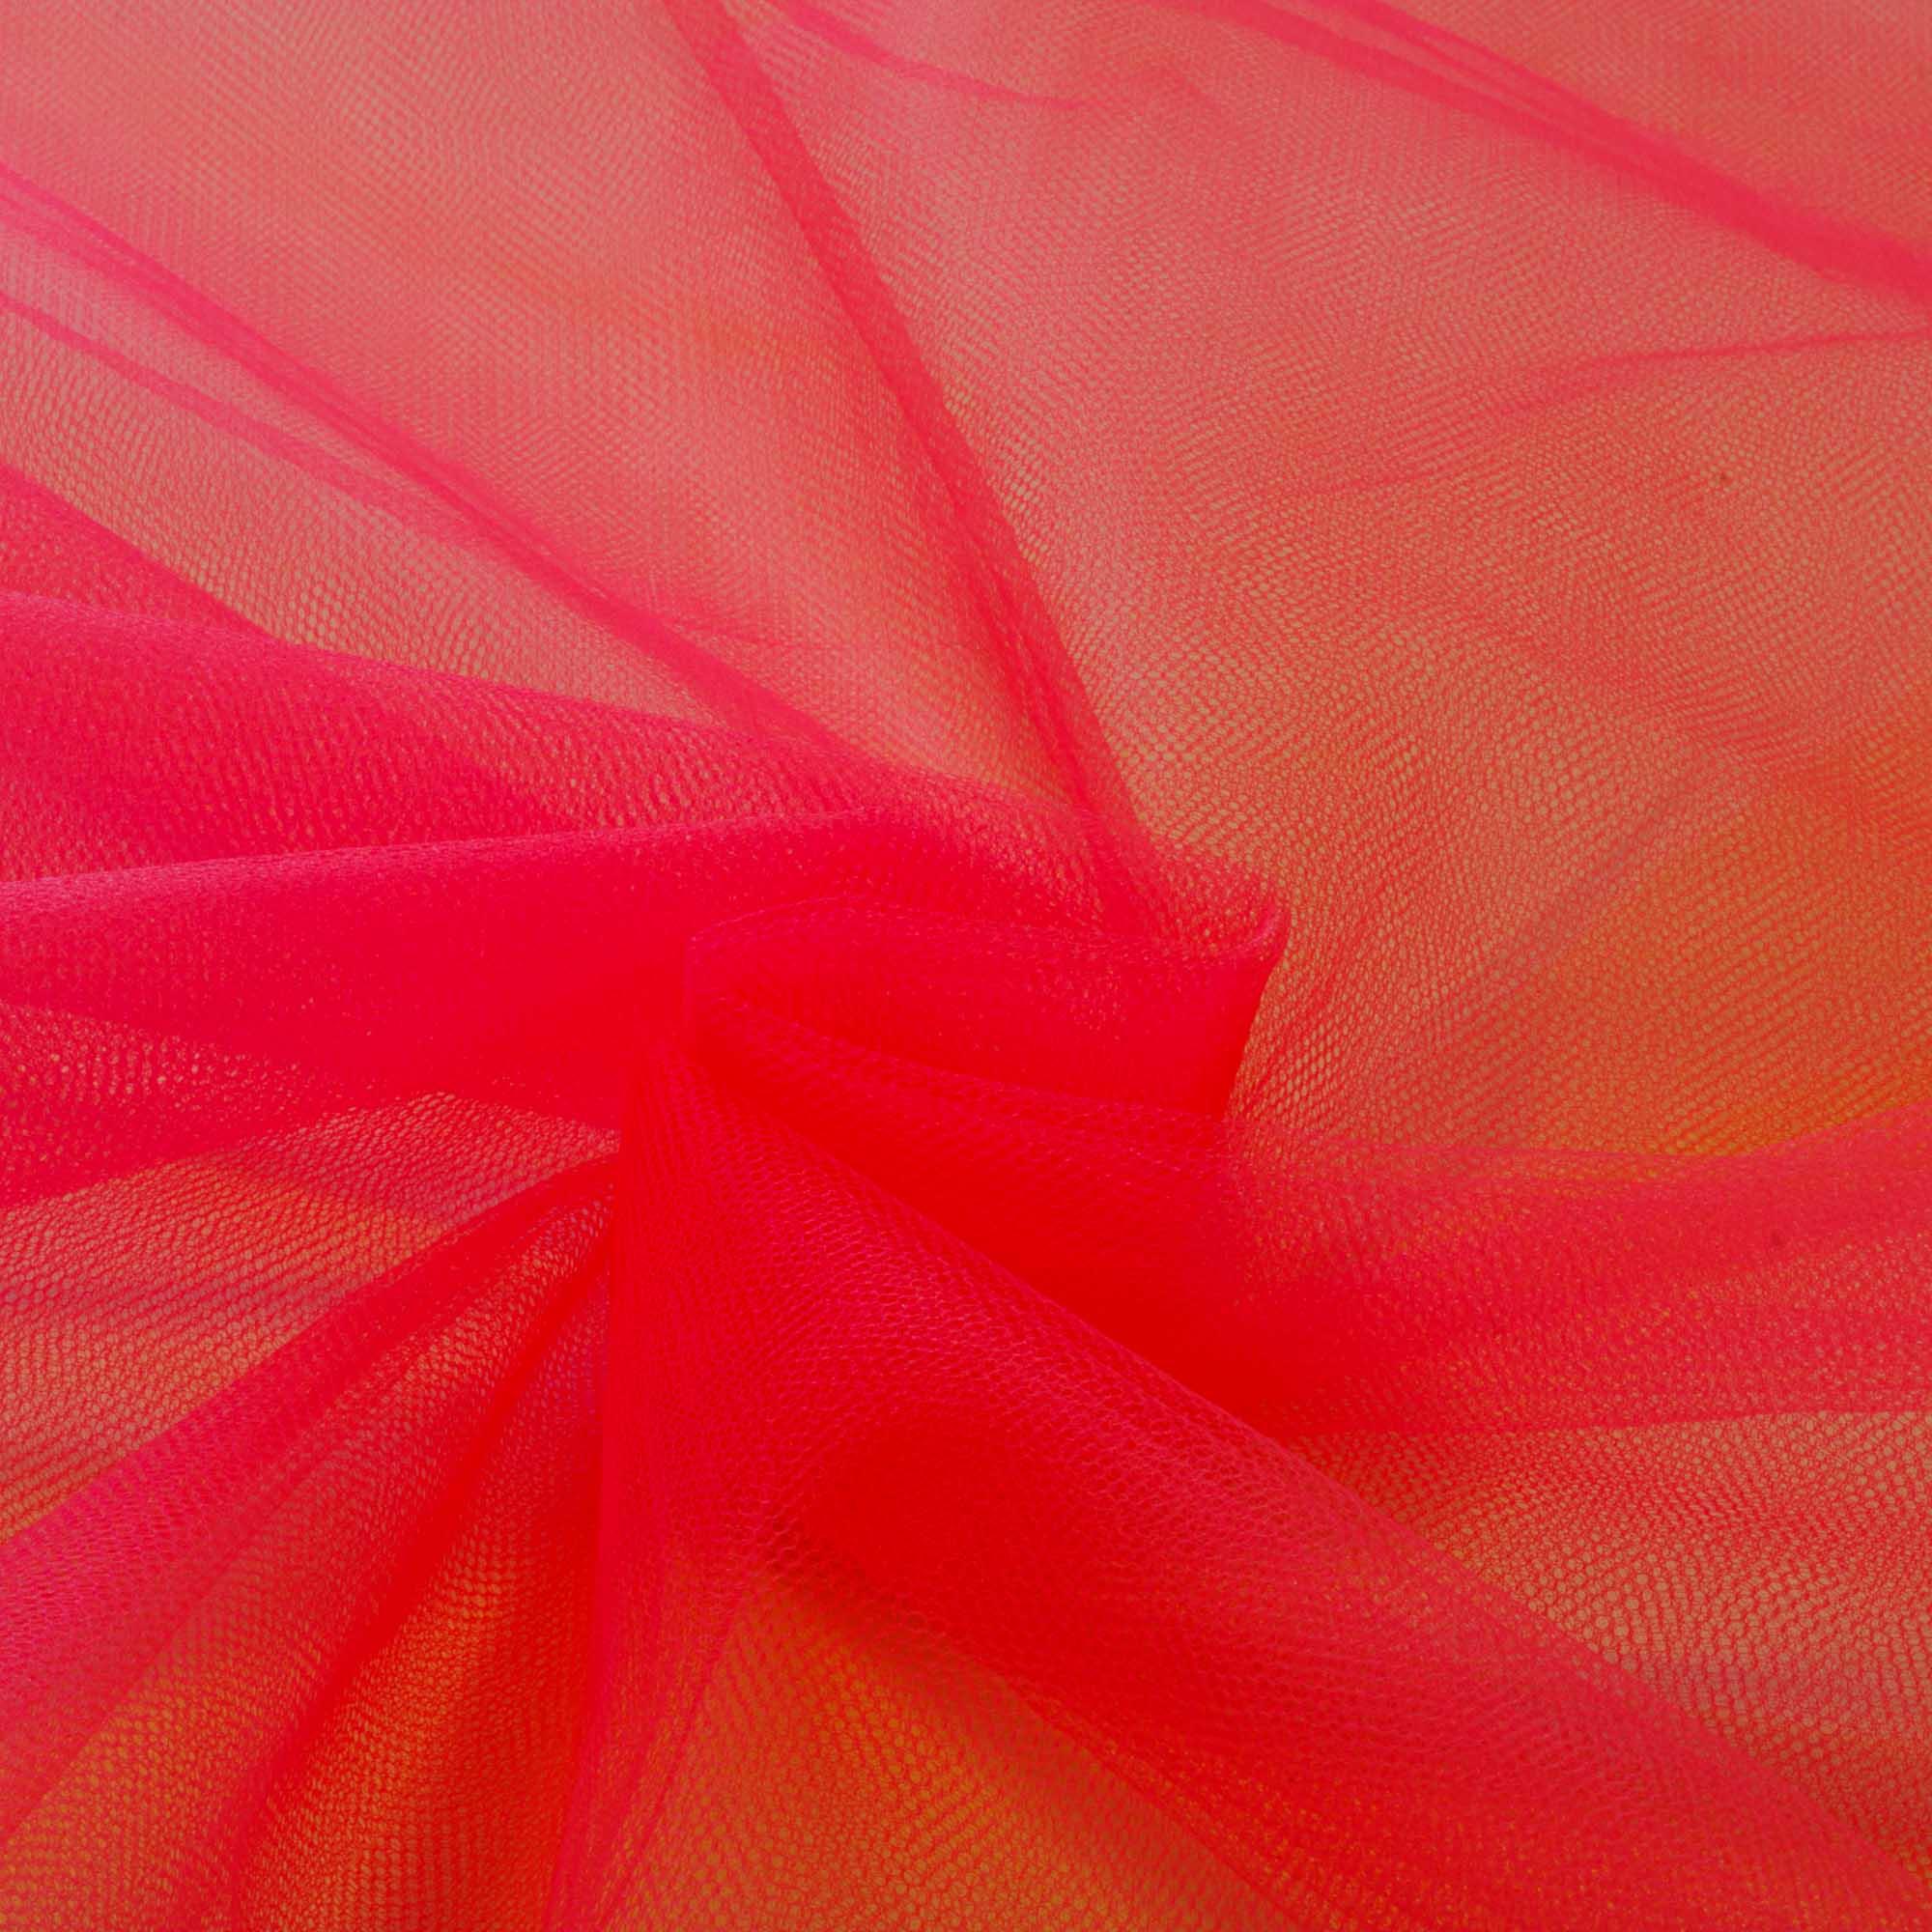 Tecido Tule 100% Poliester 1,20 Mt Largura 050 Rosa Maravilha